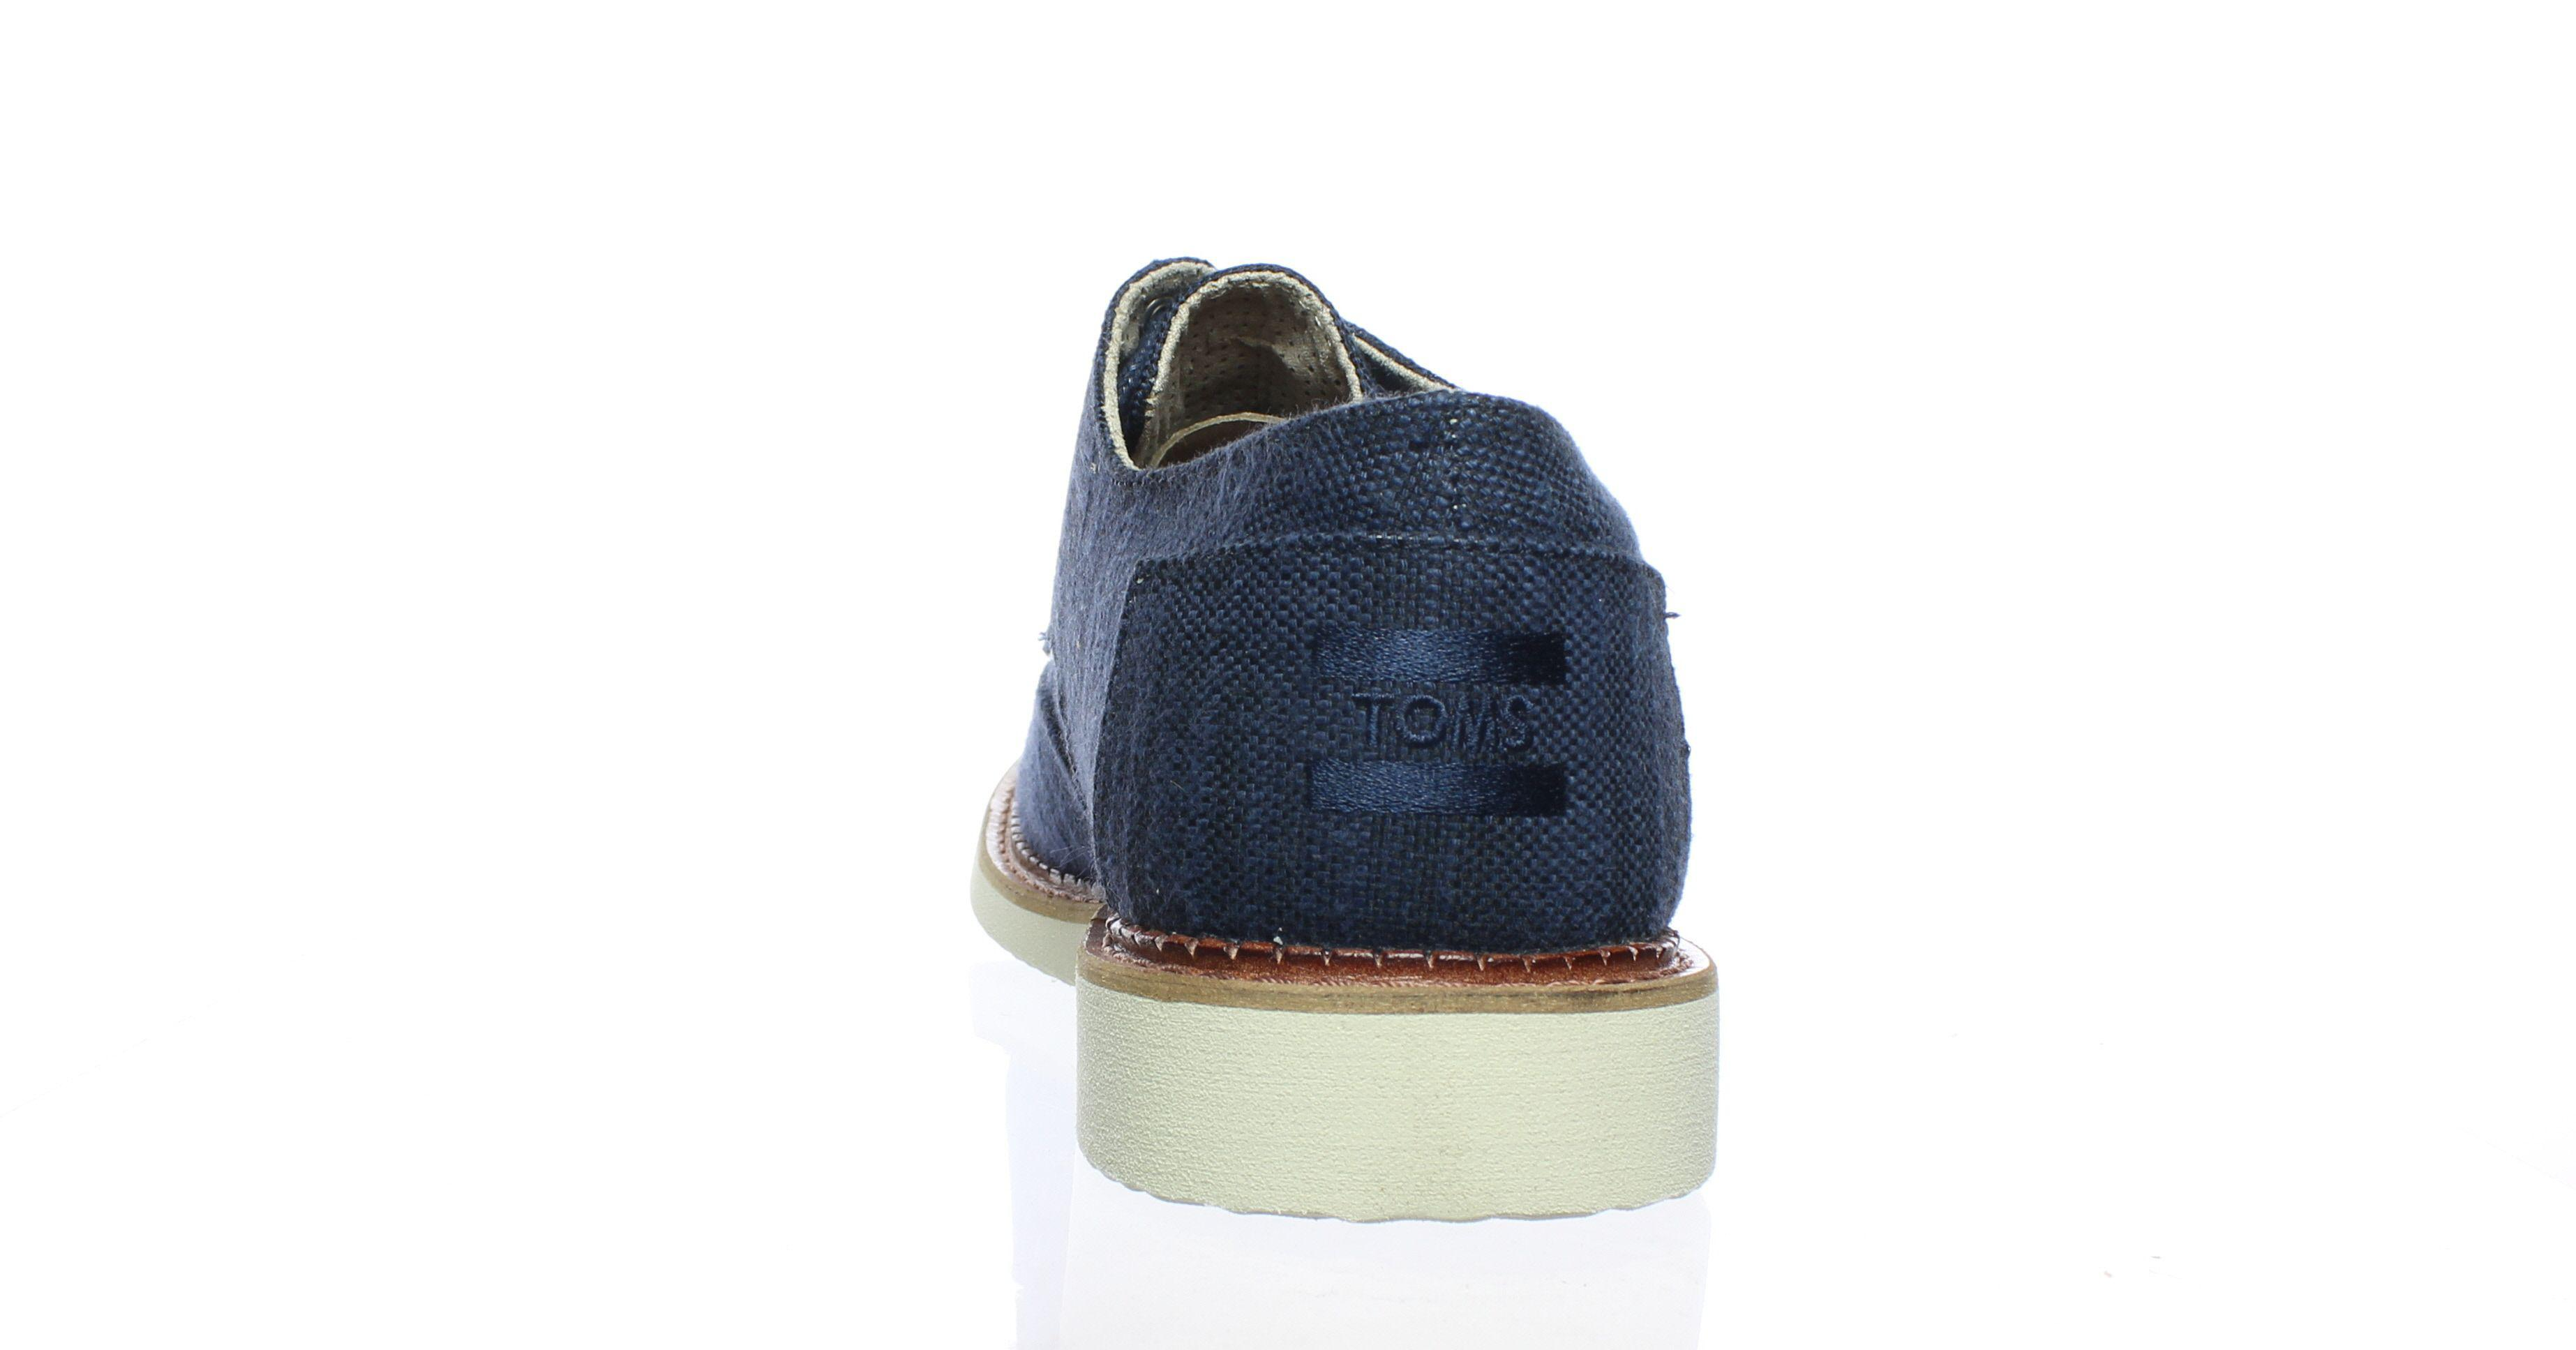 88bb886642f TOMS - Blue Mens Brogue Oxford Dress Shoe for Men - Lyst. View fullscreen